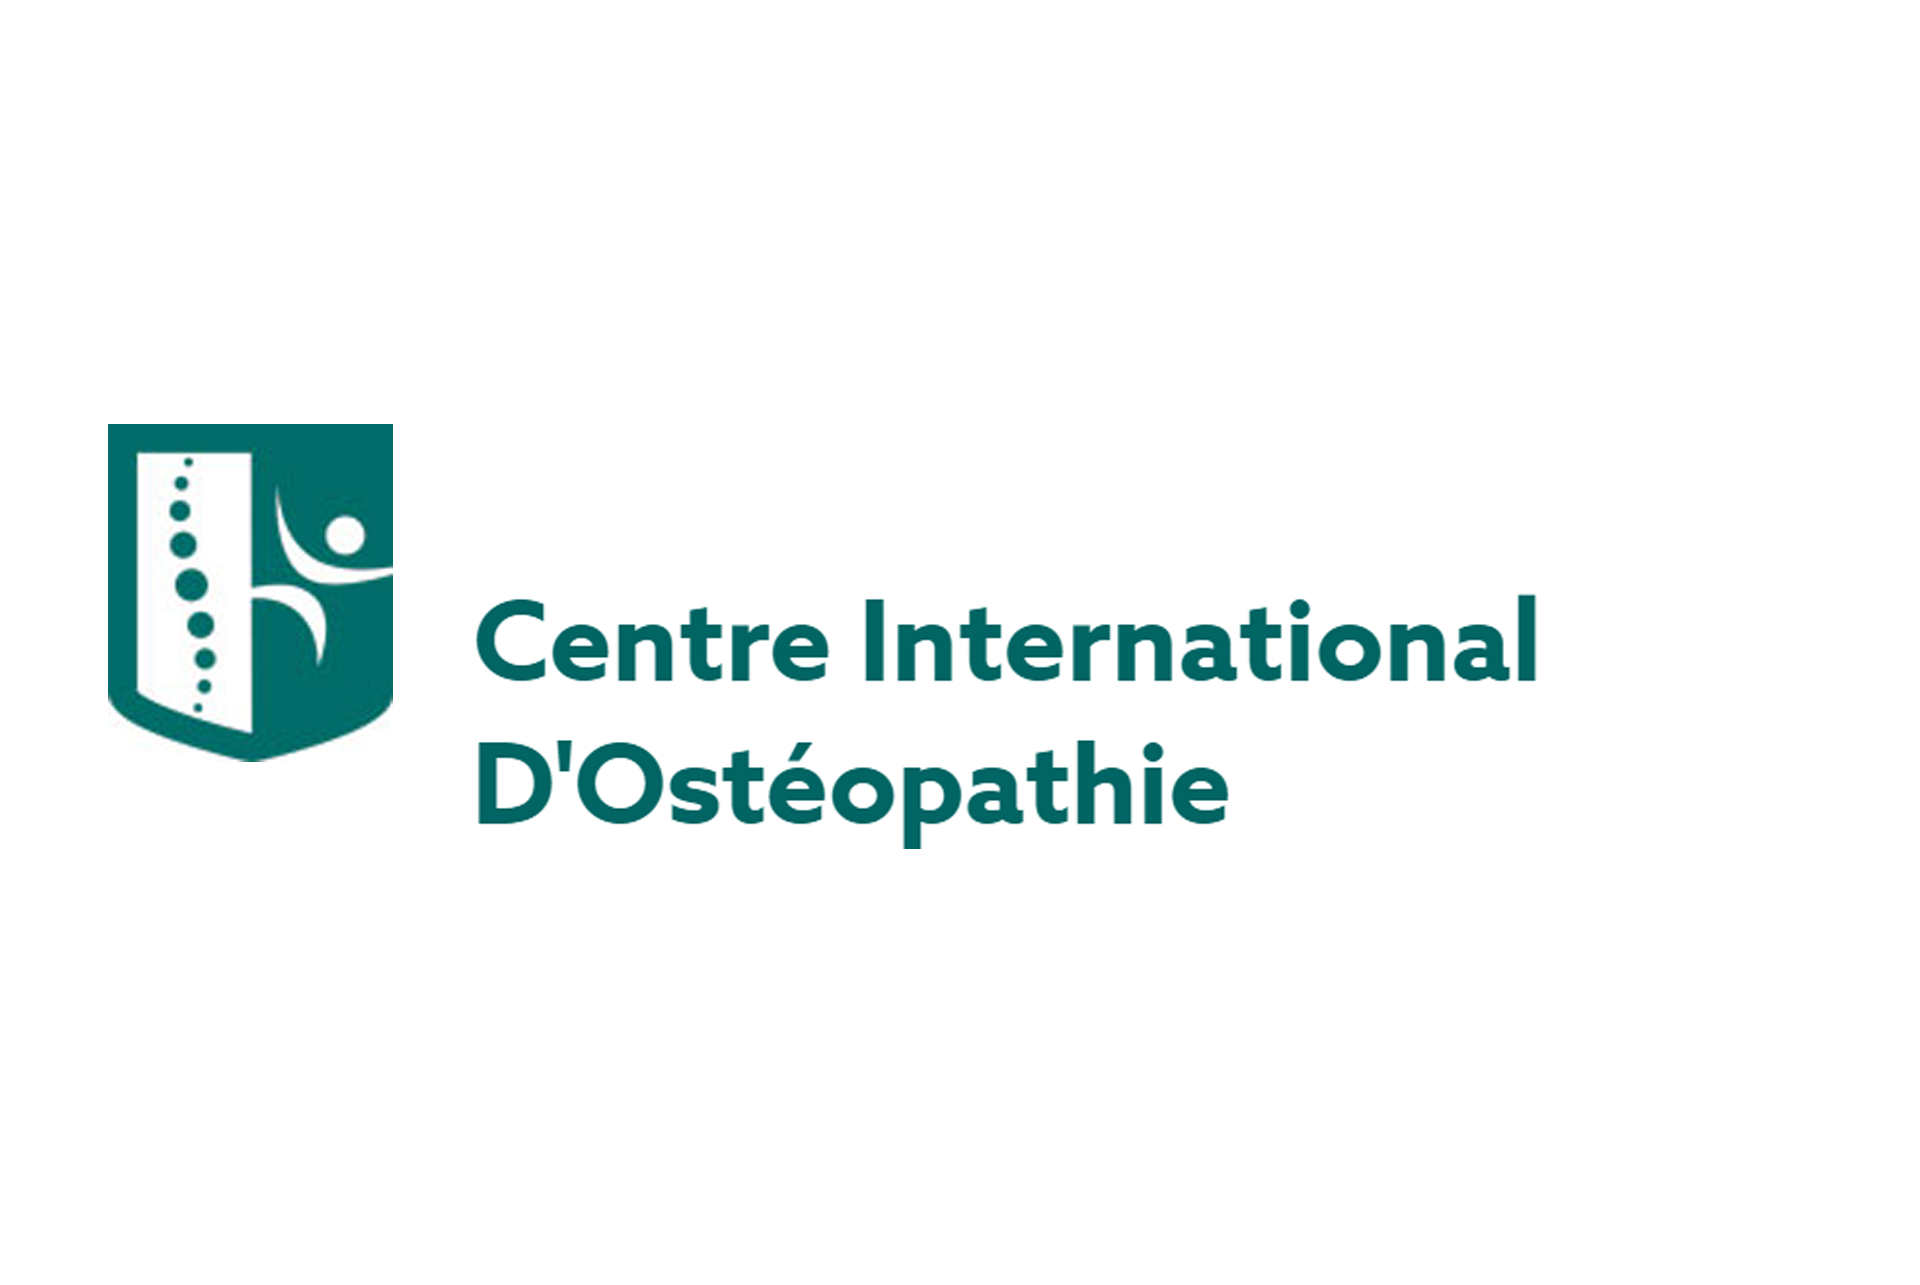 logo-cido-osteopathie